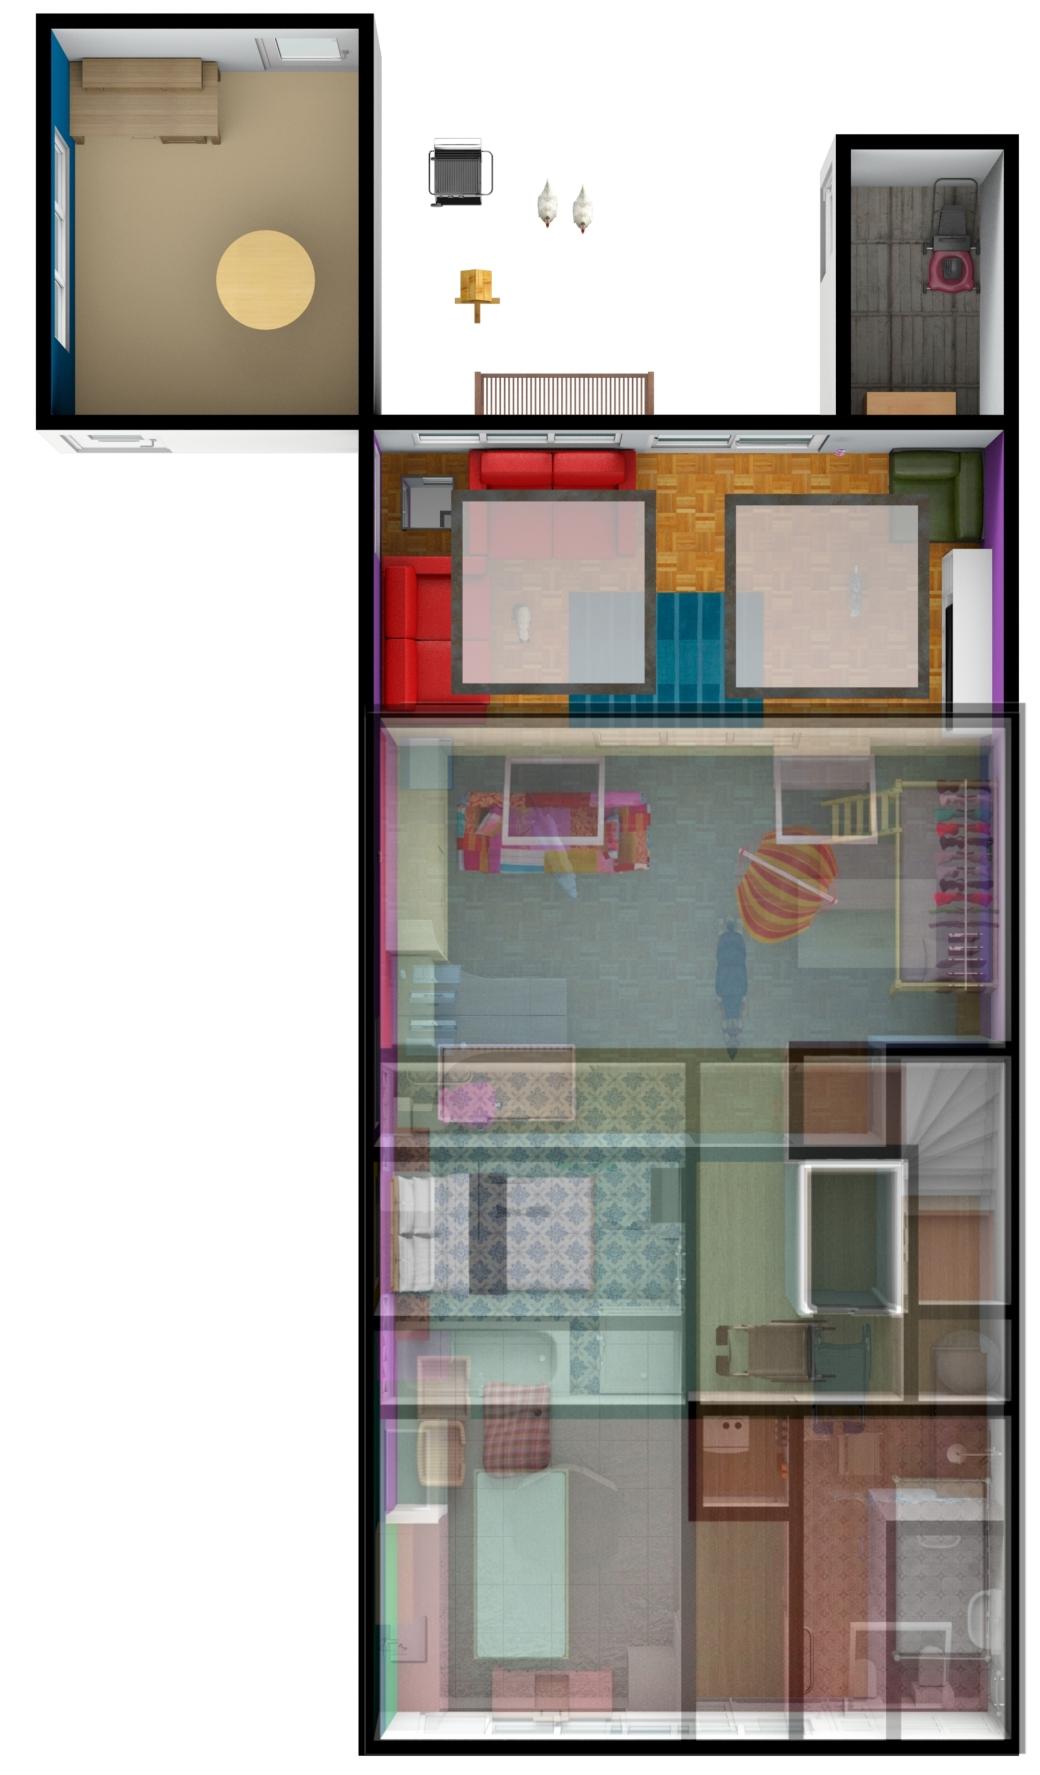 Floors merged wider